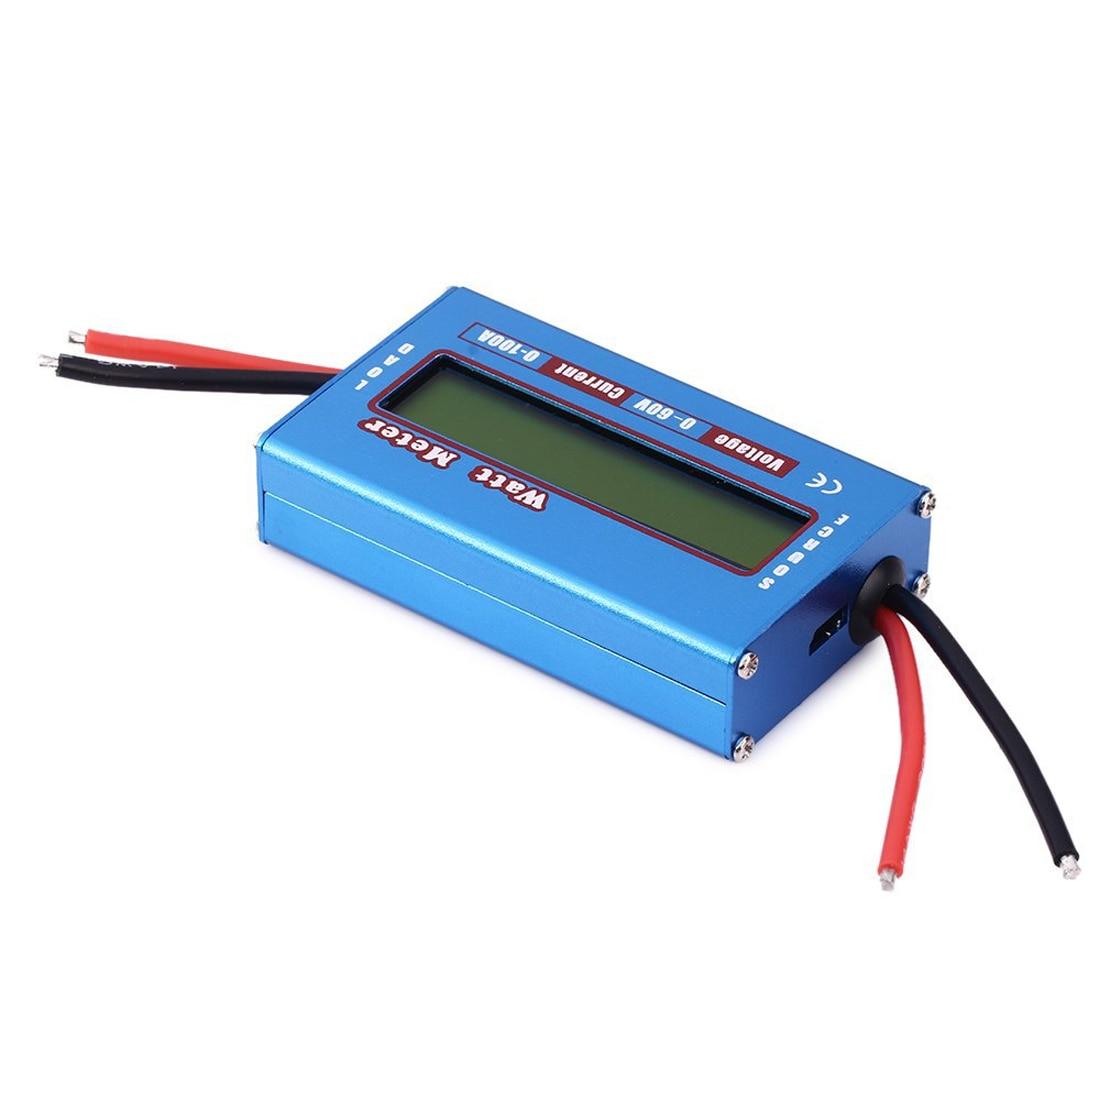 LCD Digital For DC 60V/100A Balance Voltage RC Battery Power Analyzer Watt Meter new 4 8v 60v 150a lcd g t power module rc watt meter tester and power analyzer high precision